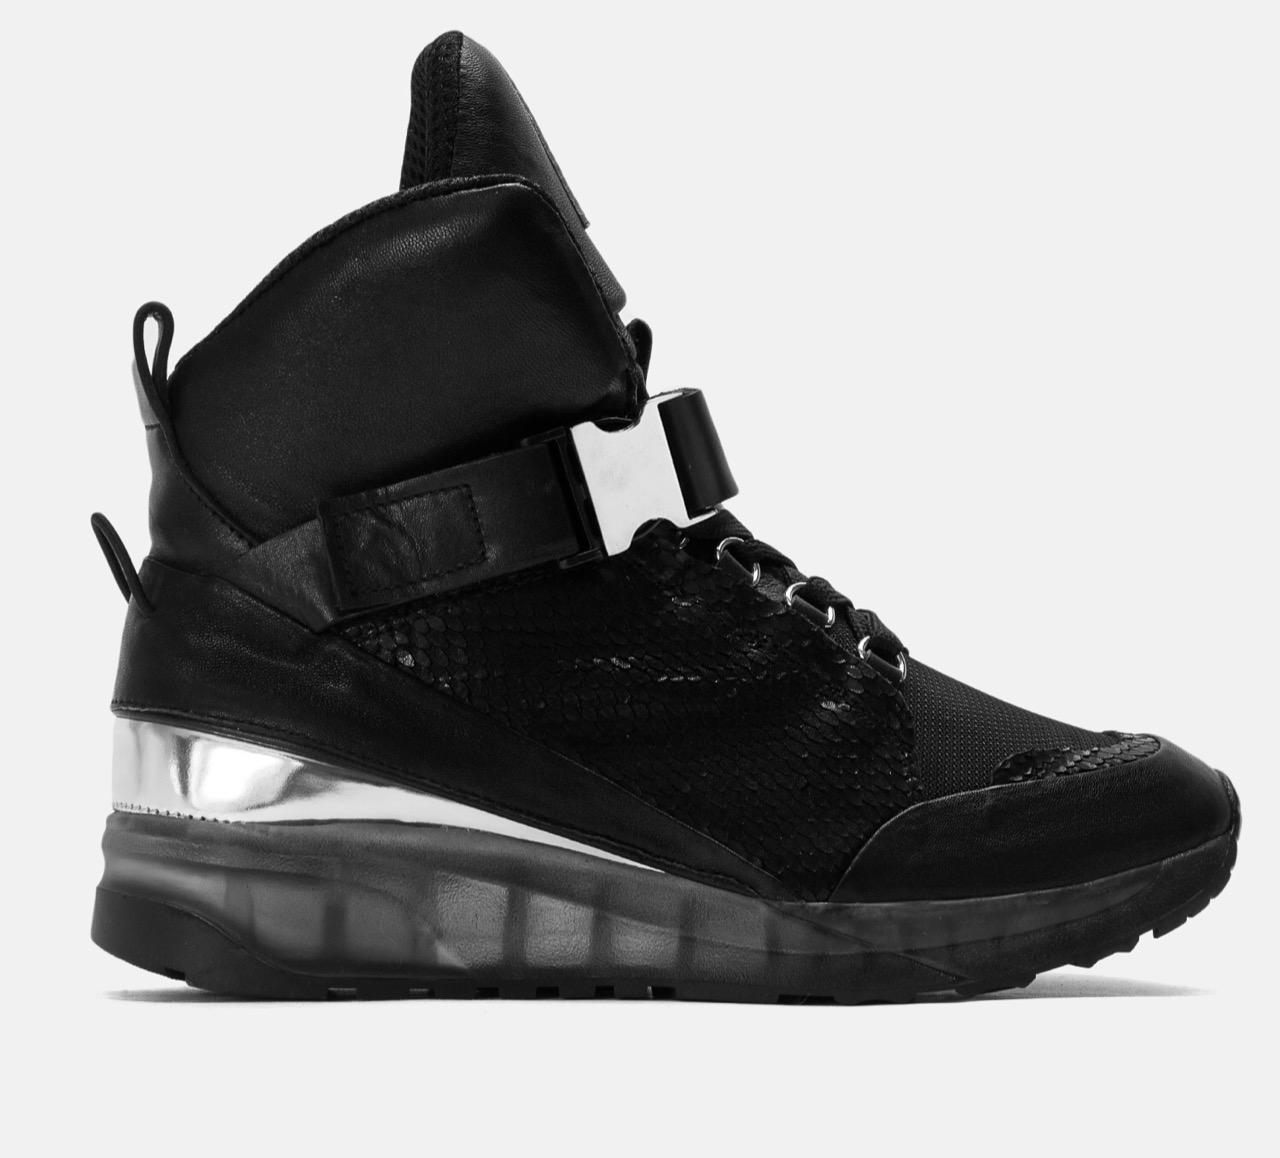 4. kép: Leslie fekete utcai sportcipő 29.990 forint